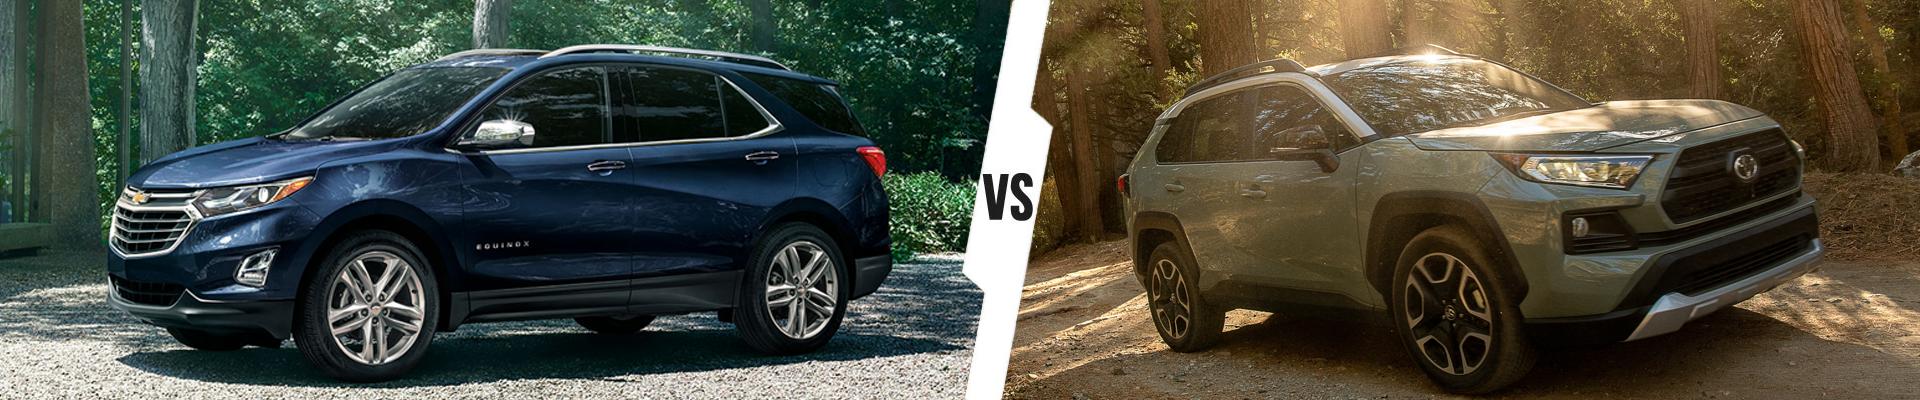 Compact Crossover SUV Comparison: 2021 Chevrolet Equinox Versus 2021 Toyota RAV4